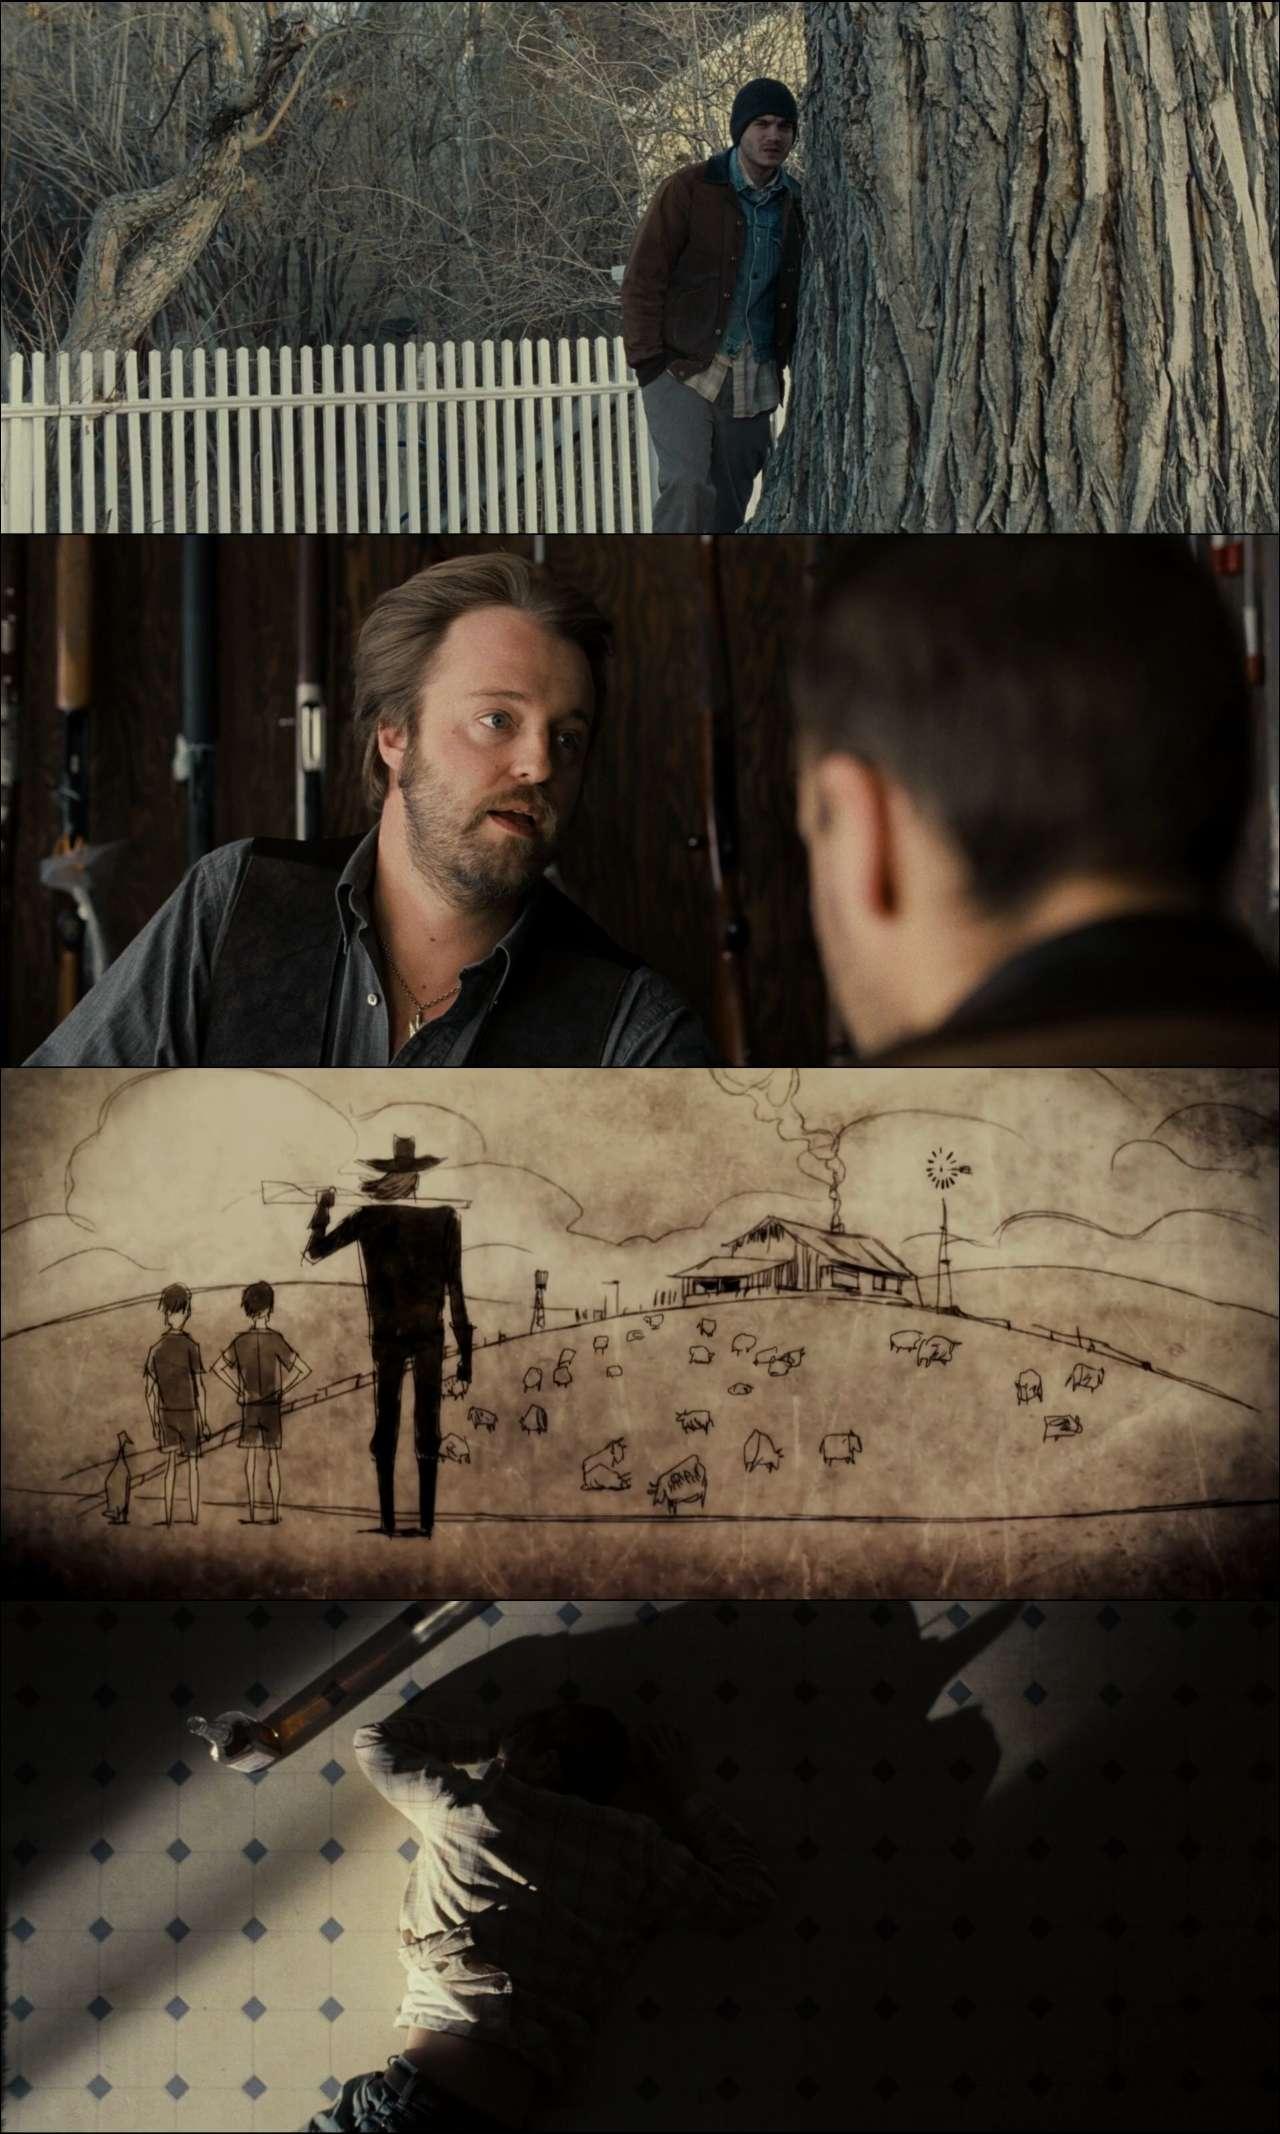 Motel Hayatı - The Motel Life (2012) türkçe dublaj film indir